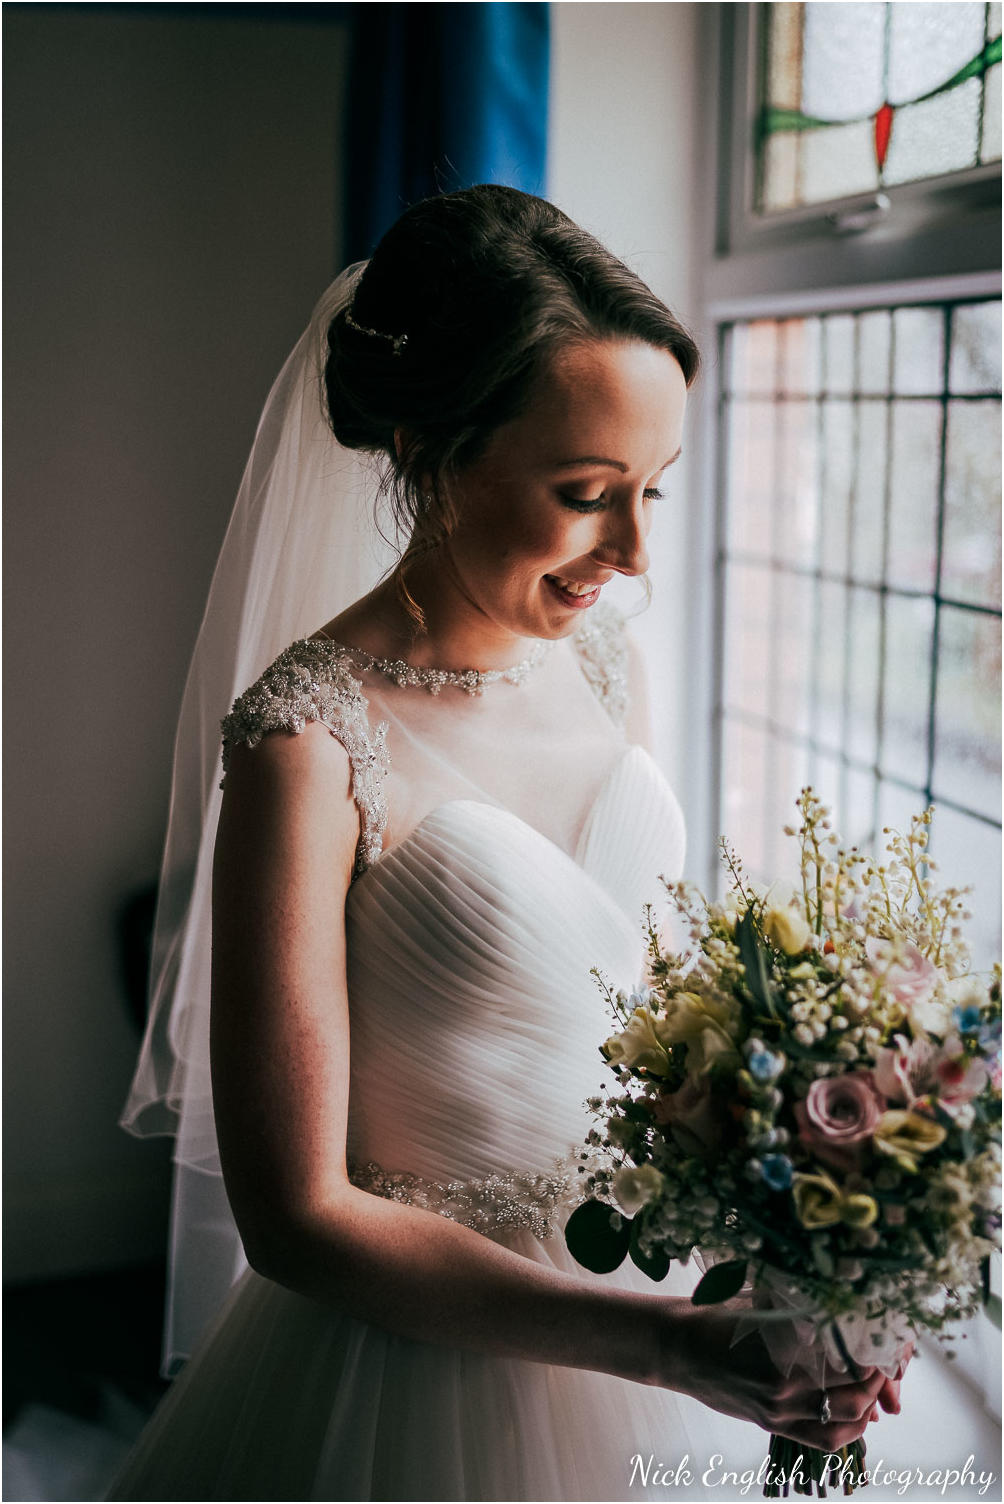 Mitton_Hall_Wedding_Photographer-16.jpg